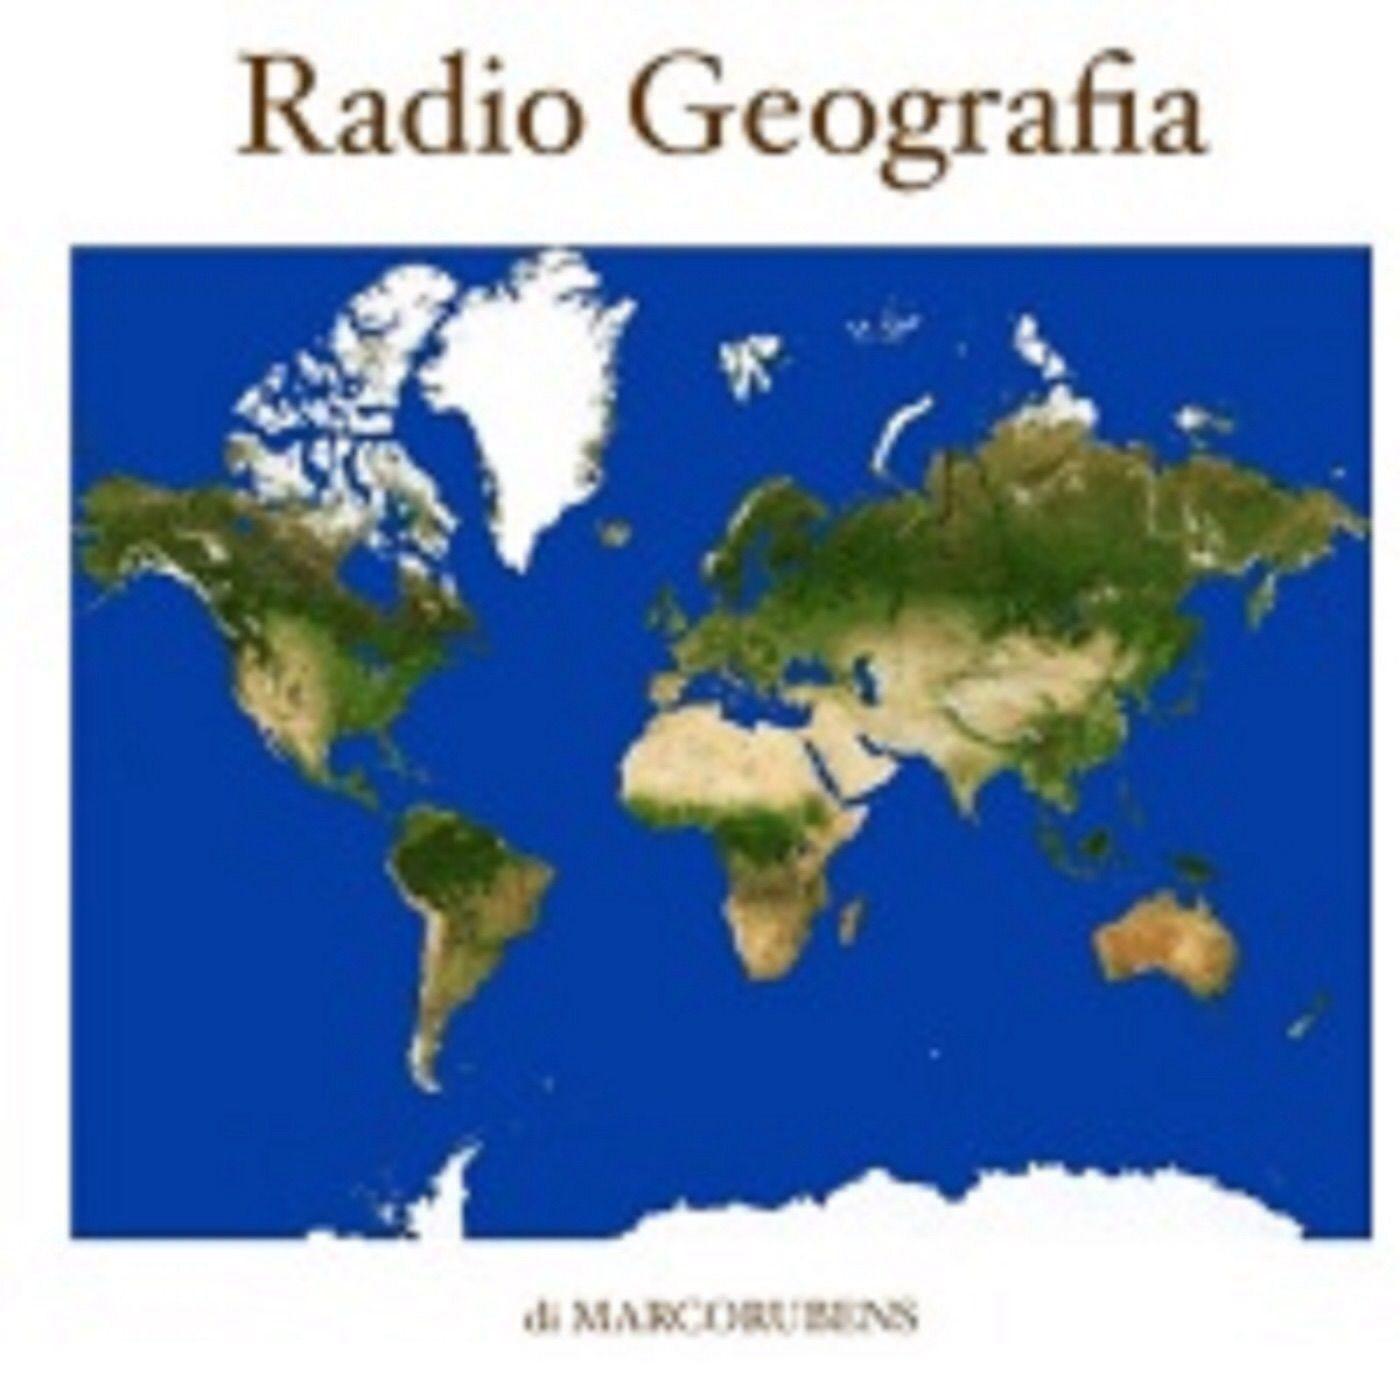 Radio Geografia